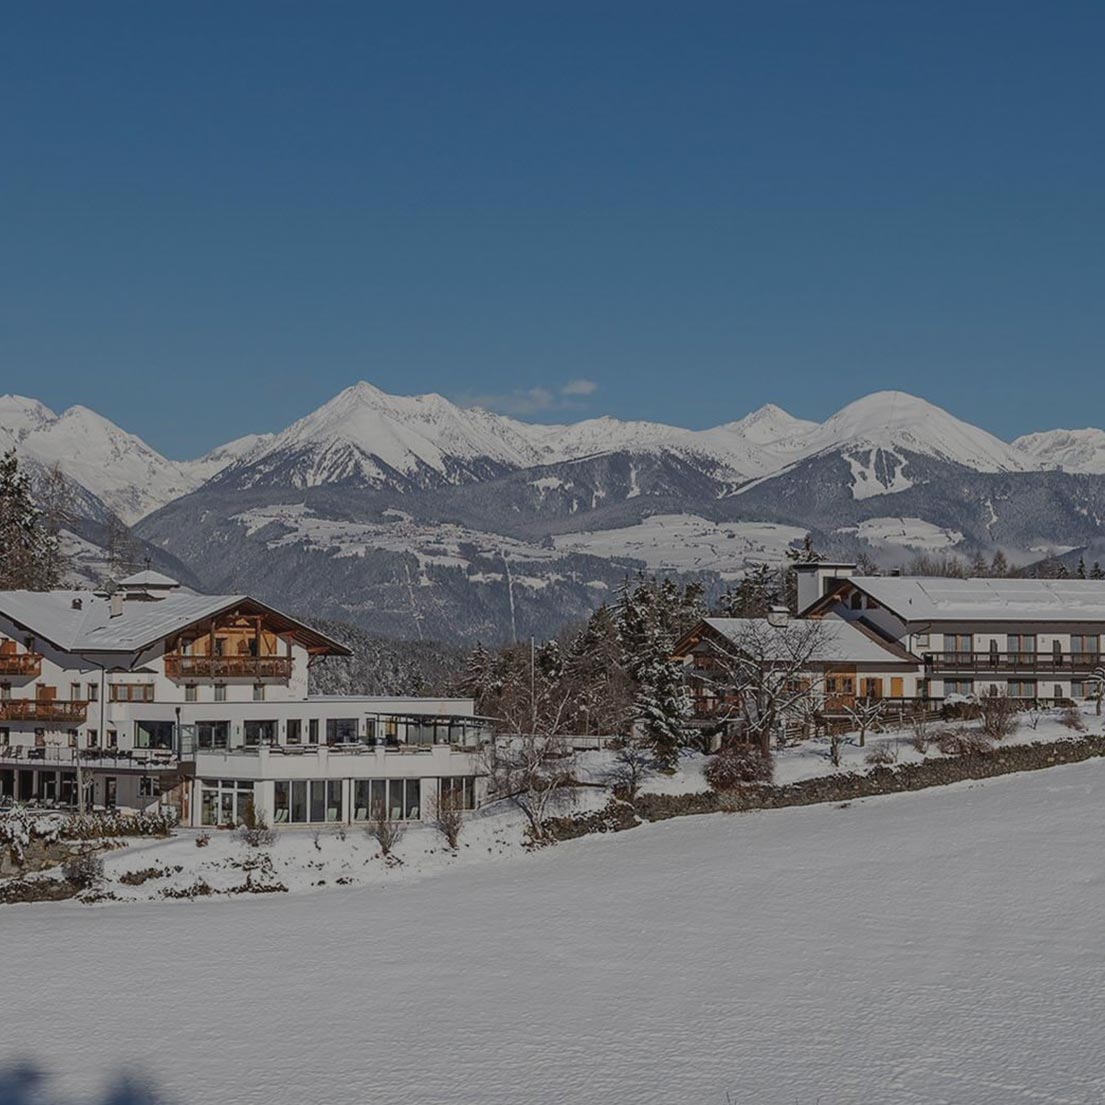 Hotel Torgglerhof in Alto Adige